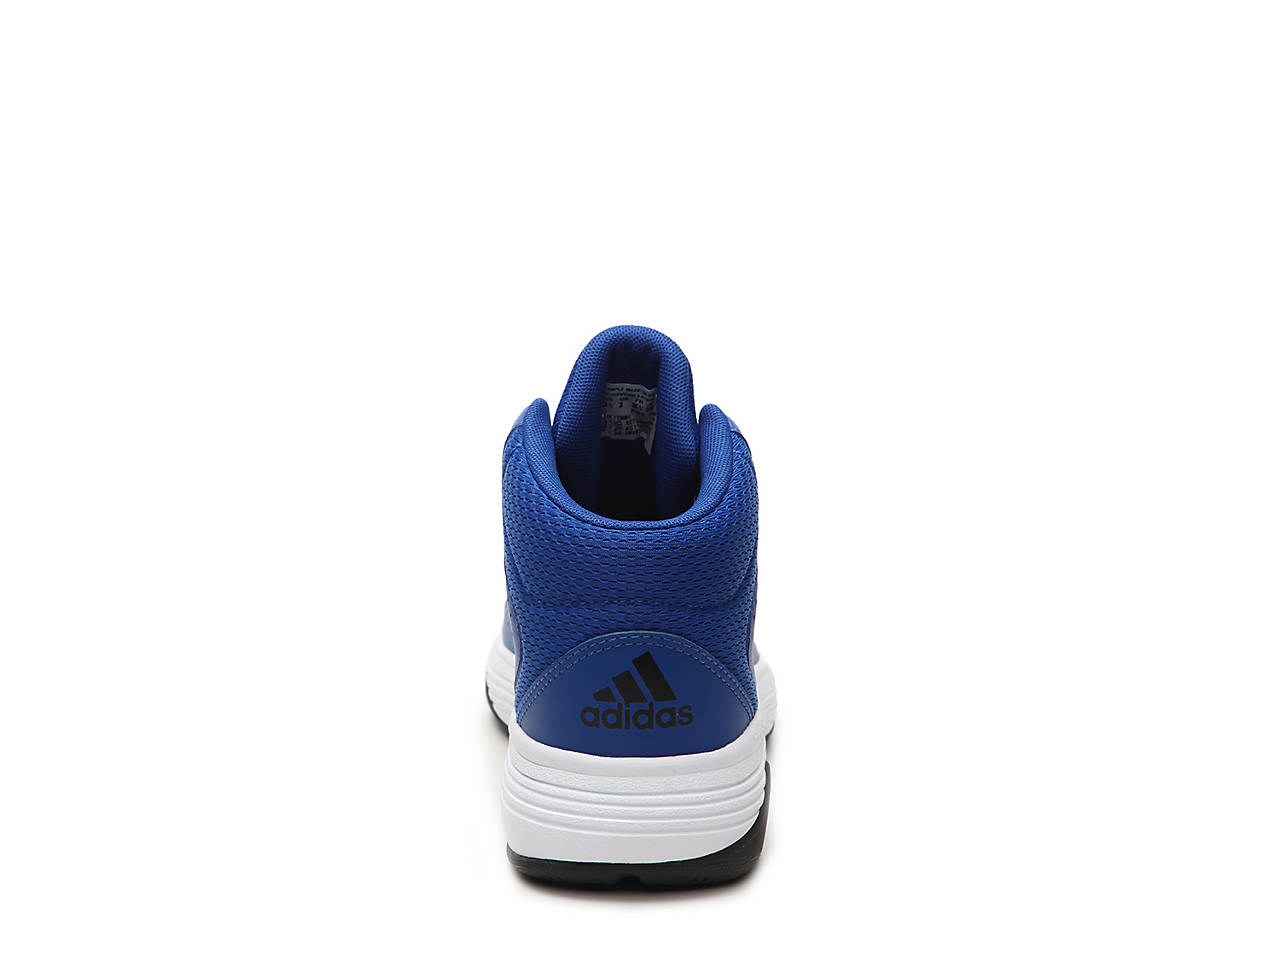 7cf065b7a5e1 previous. Cloudfoam Ilation Toddler   Youth High-Top Basketball Shoe